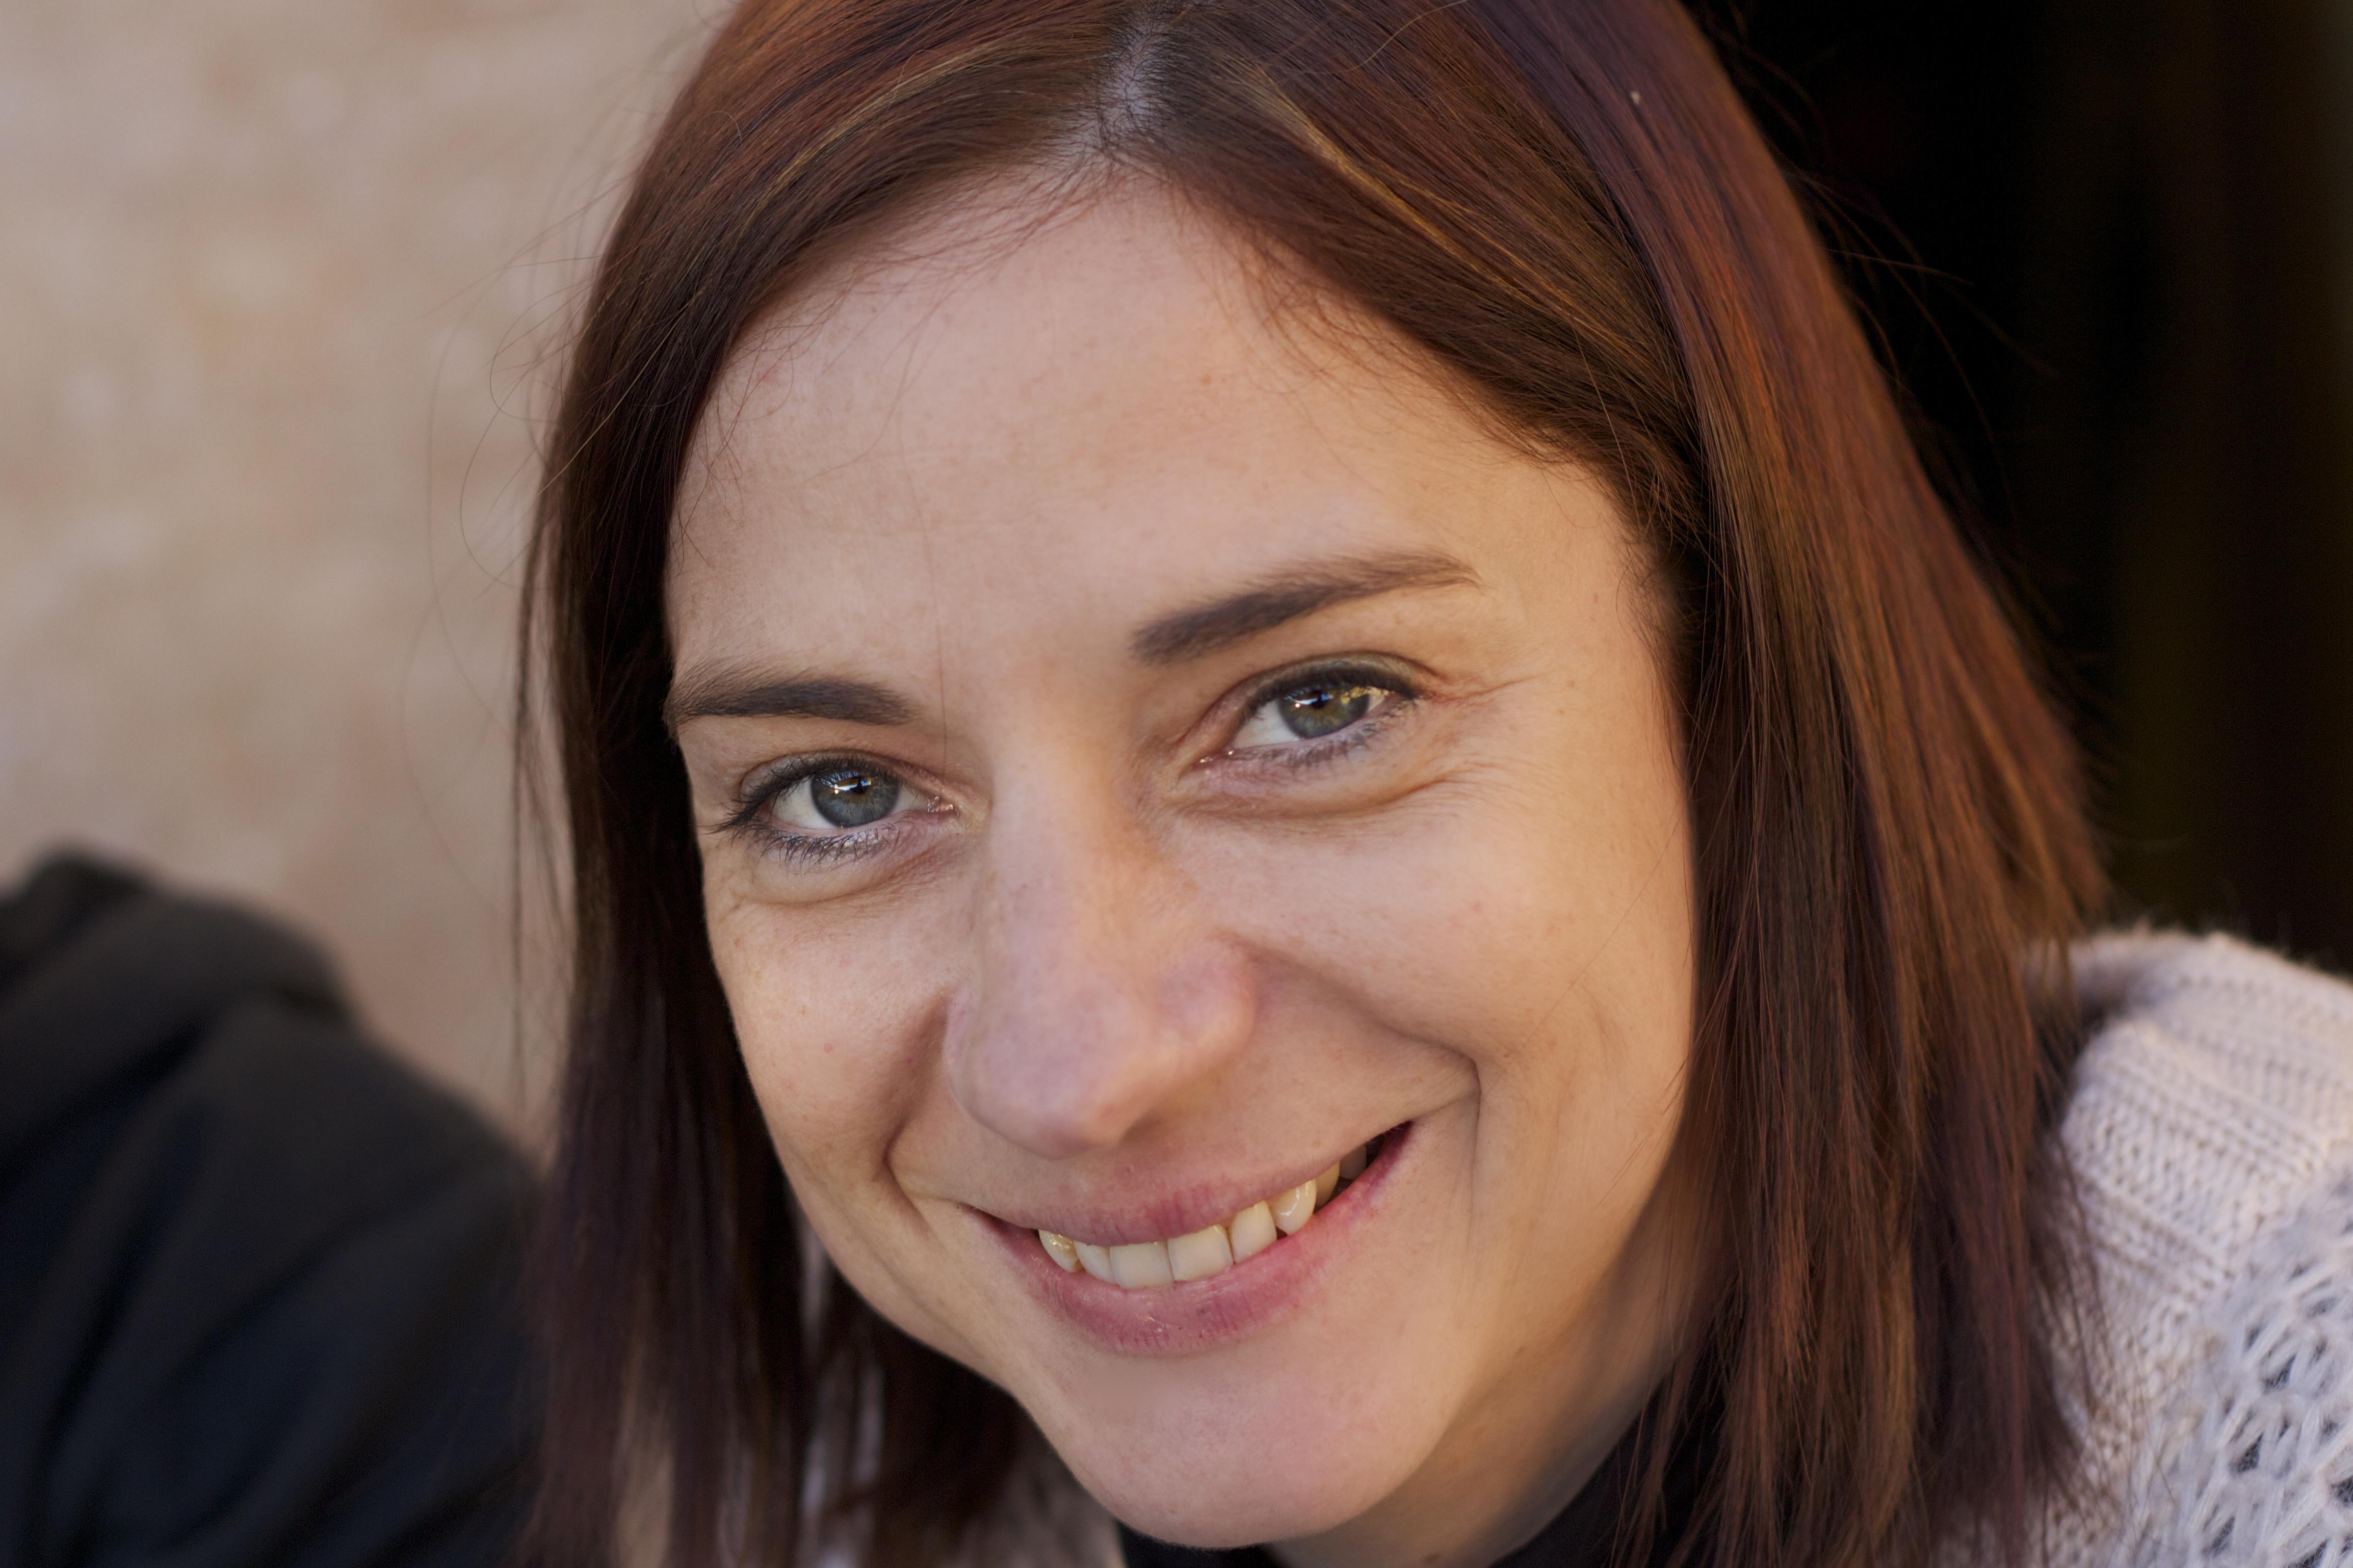 Sonia Fernández-Veledo, PhD